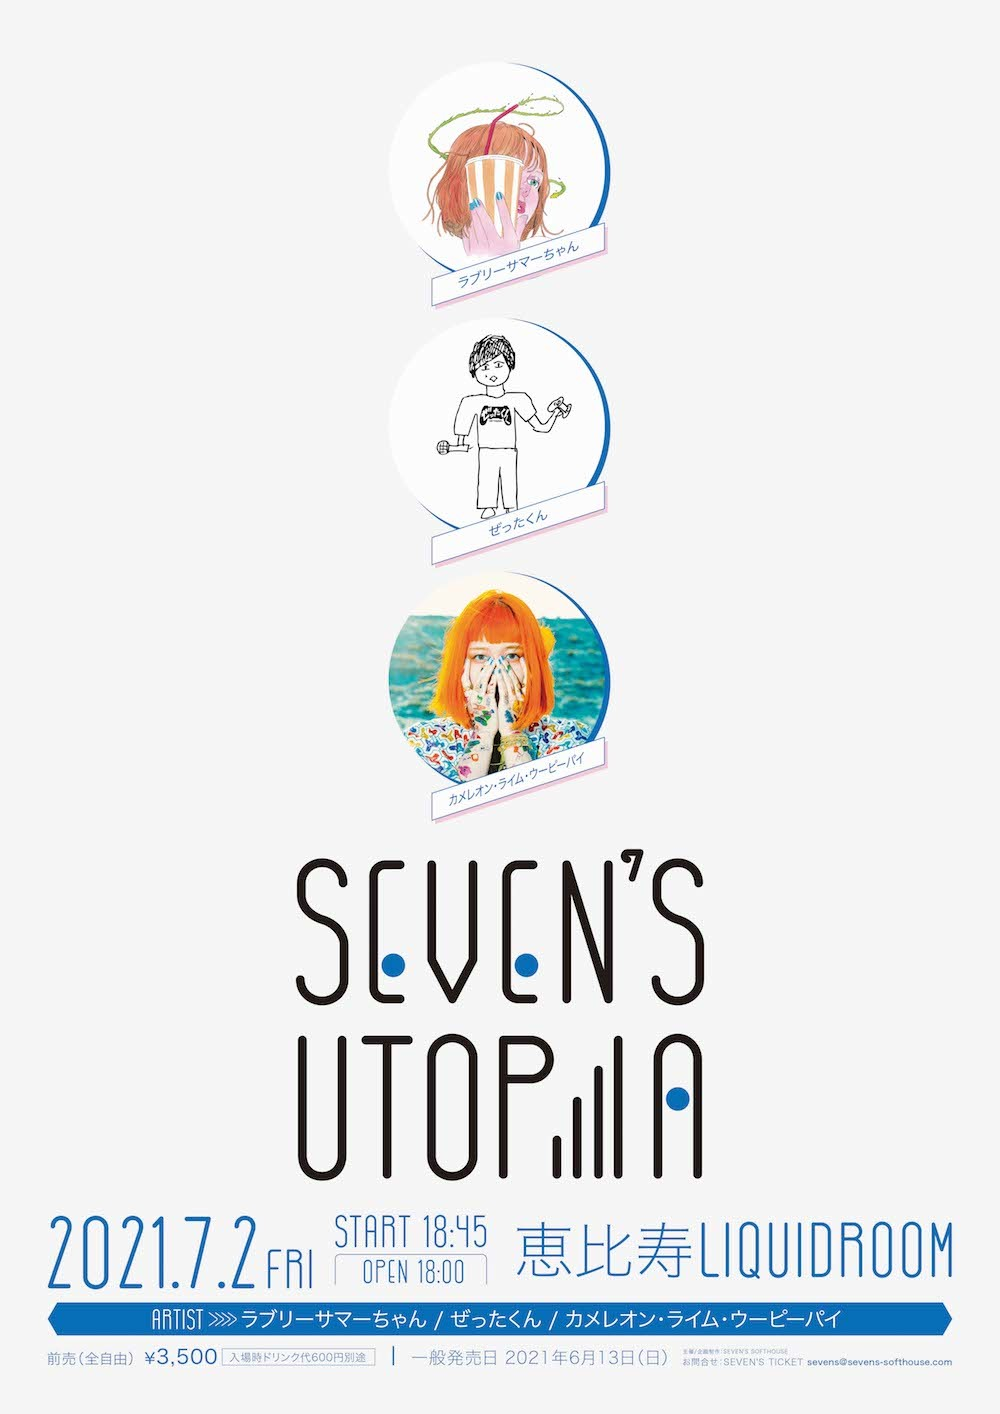 『SEVEN'S UTOPIA』